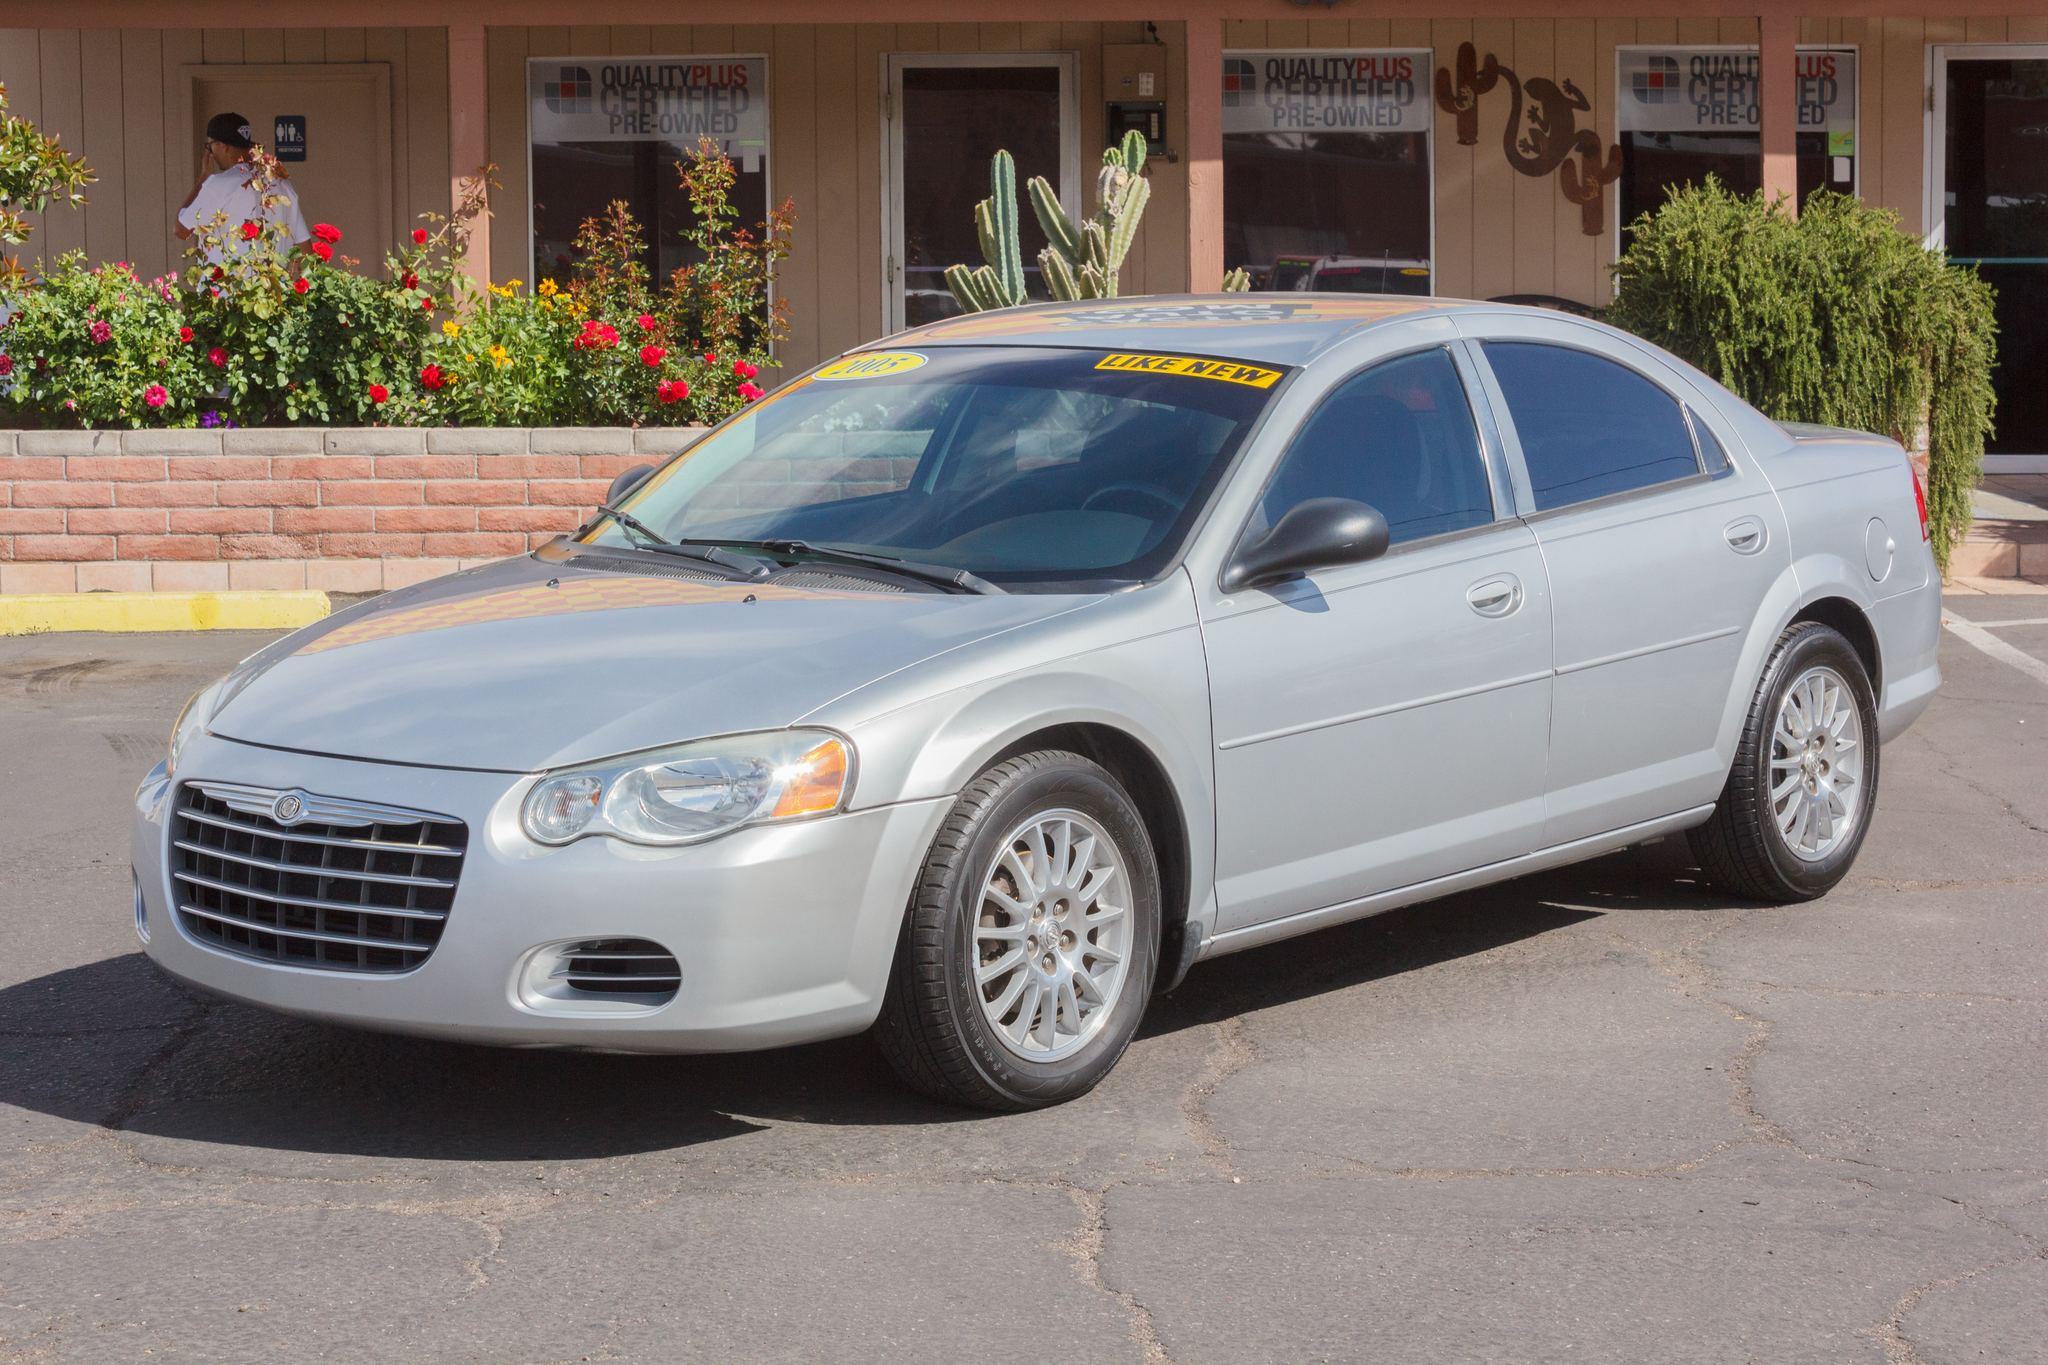 Photo of 2005 Chrysler Sebring 4d Sedan Bright Silver Metallic Clearcoat